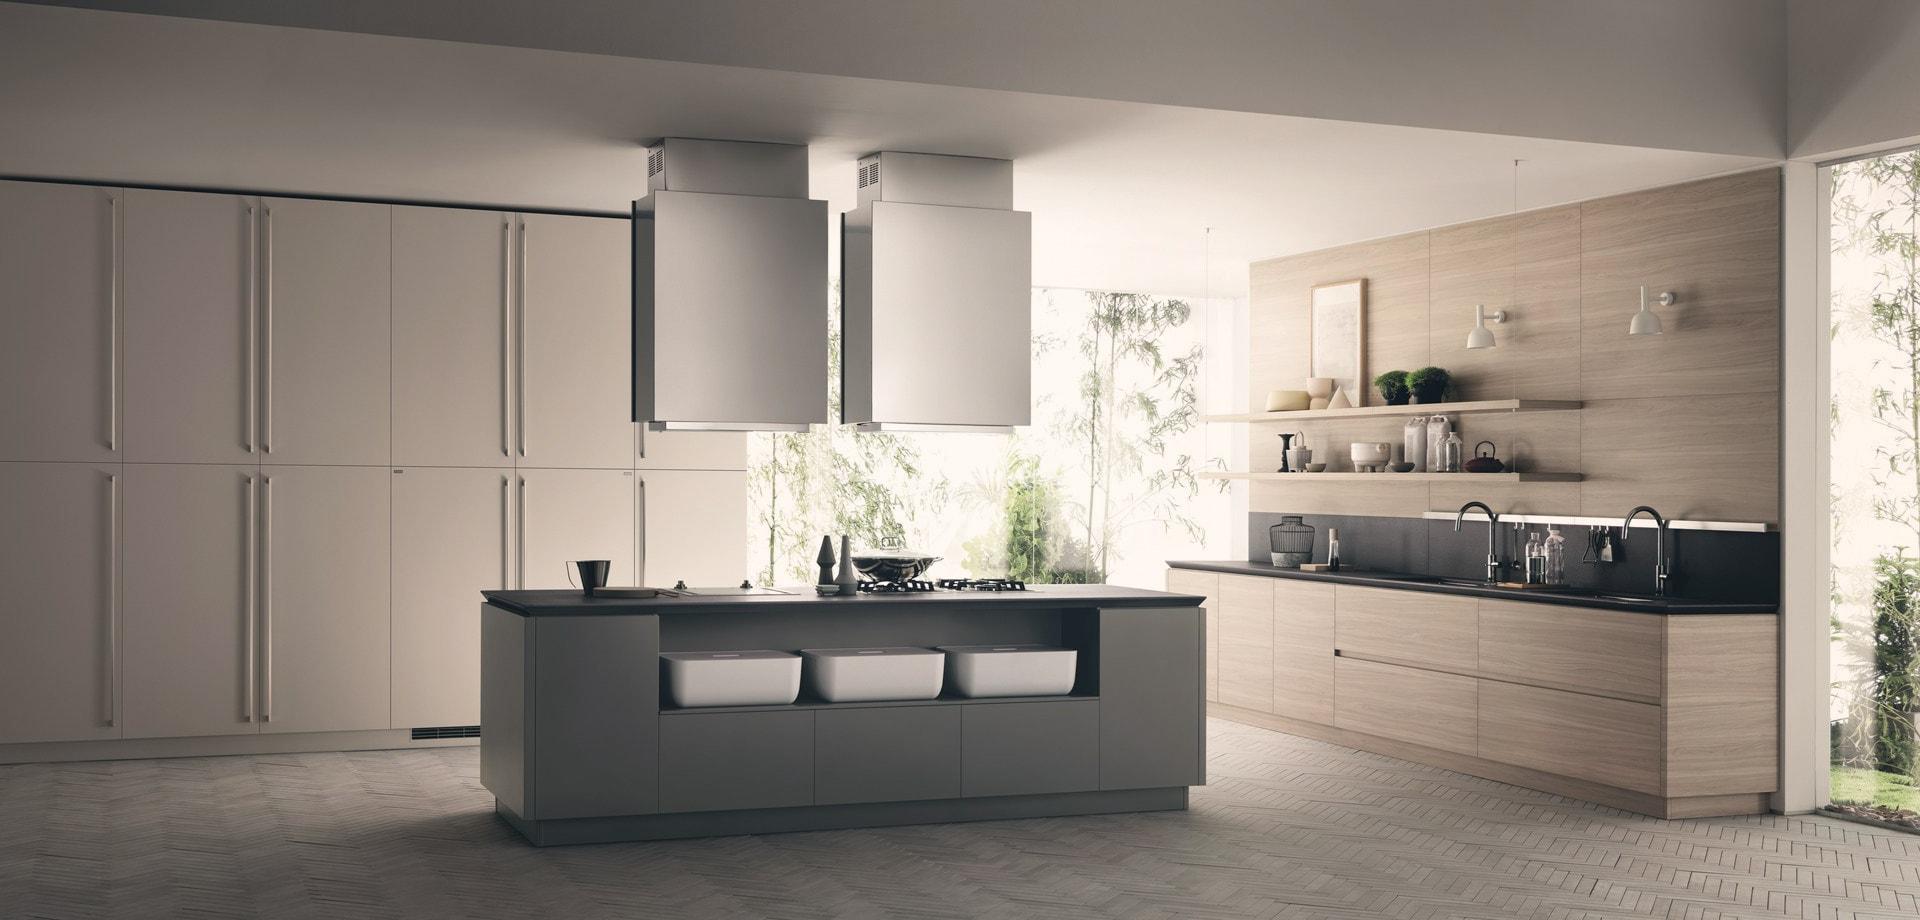 Stunning Af Mobili Messina Photos - Home Design - joygree.info